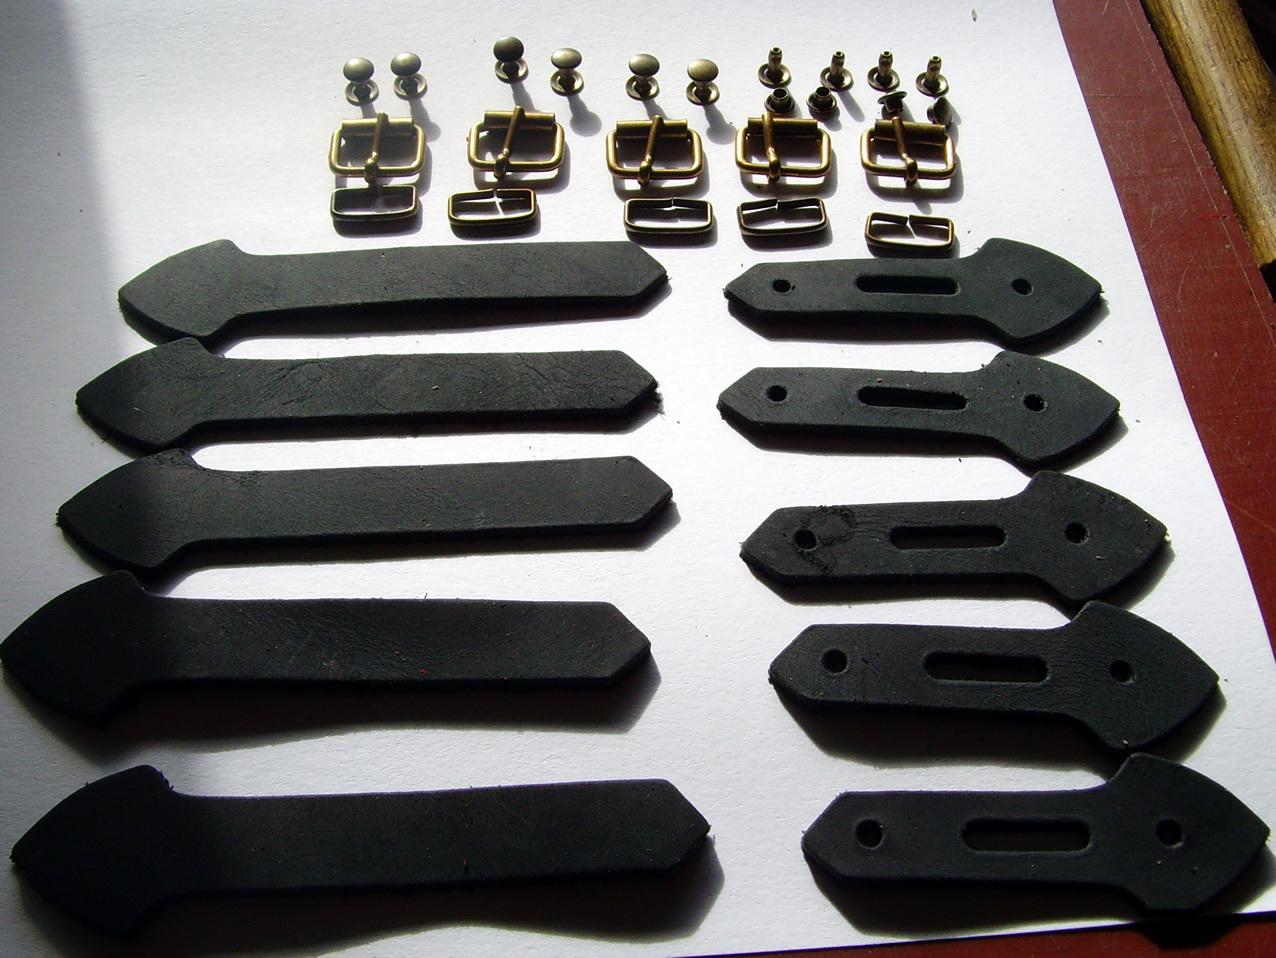 lederriemen set 16 mm schnallen messing lederverschluss. Black Bedroom Furniture Sets. Home Design Ideas